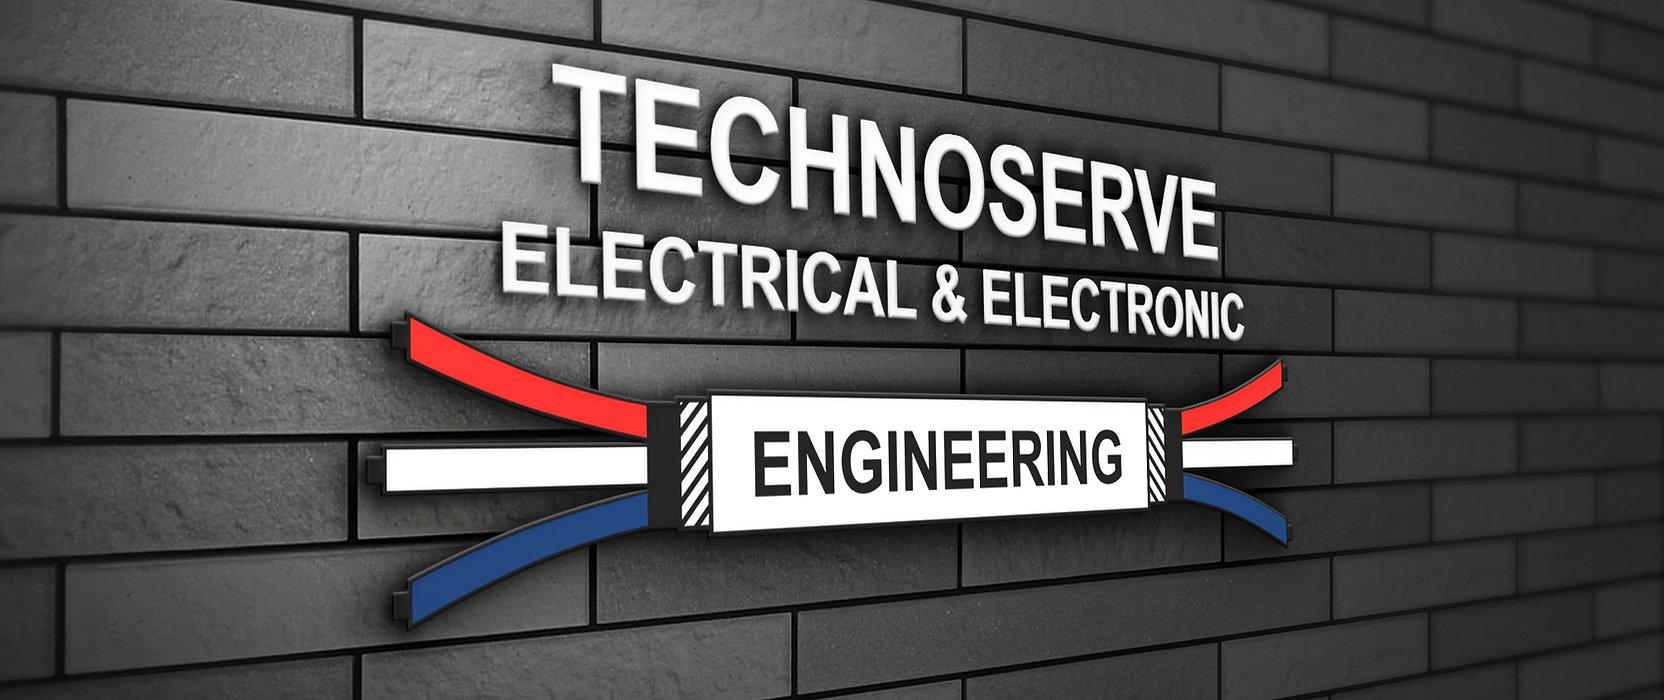 technoserve logo mockup 2.jpg